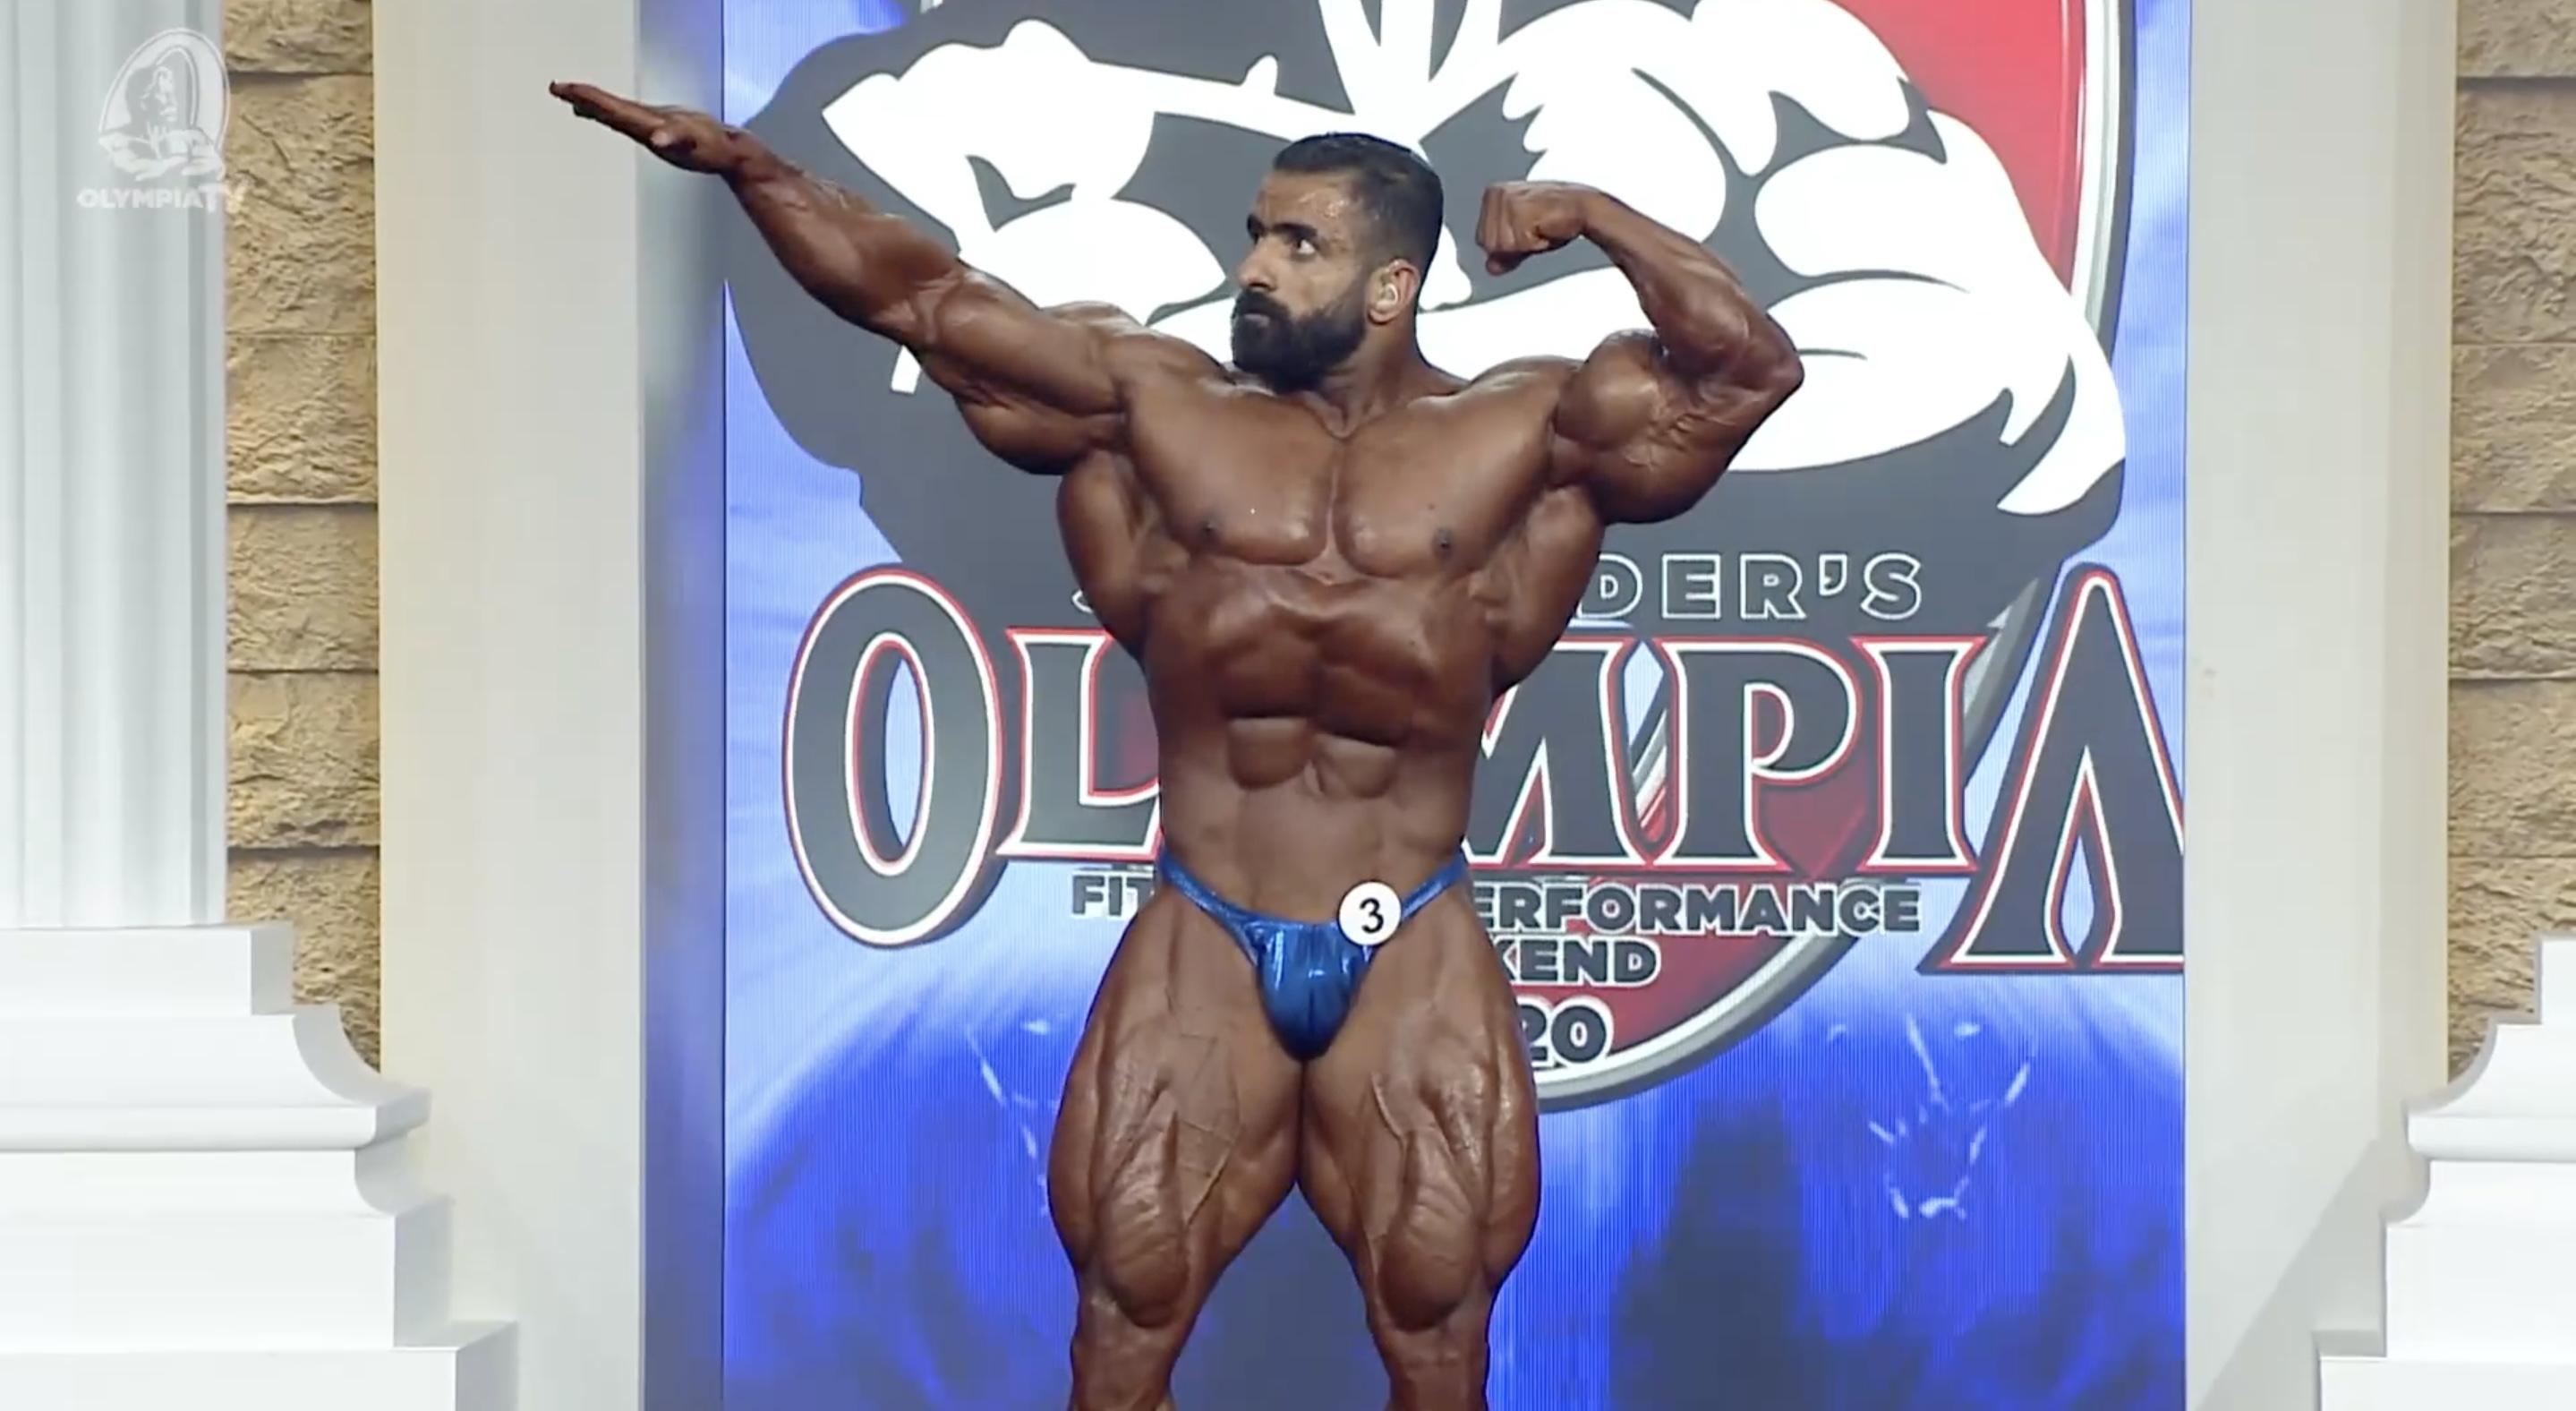 Hadi Choopan Olympia 2020